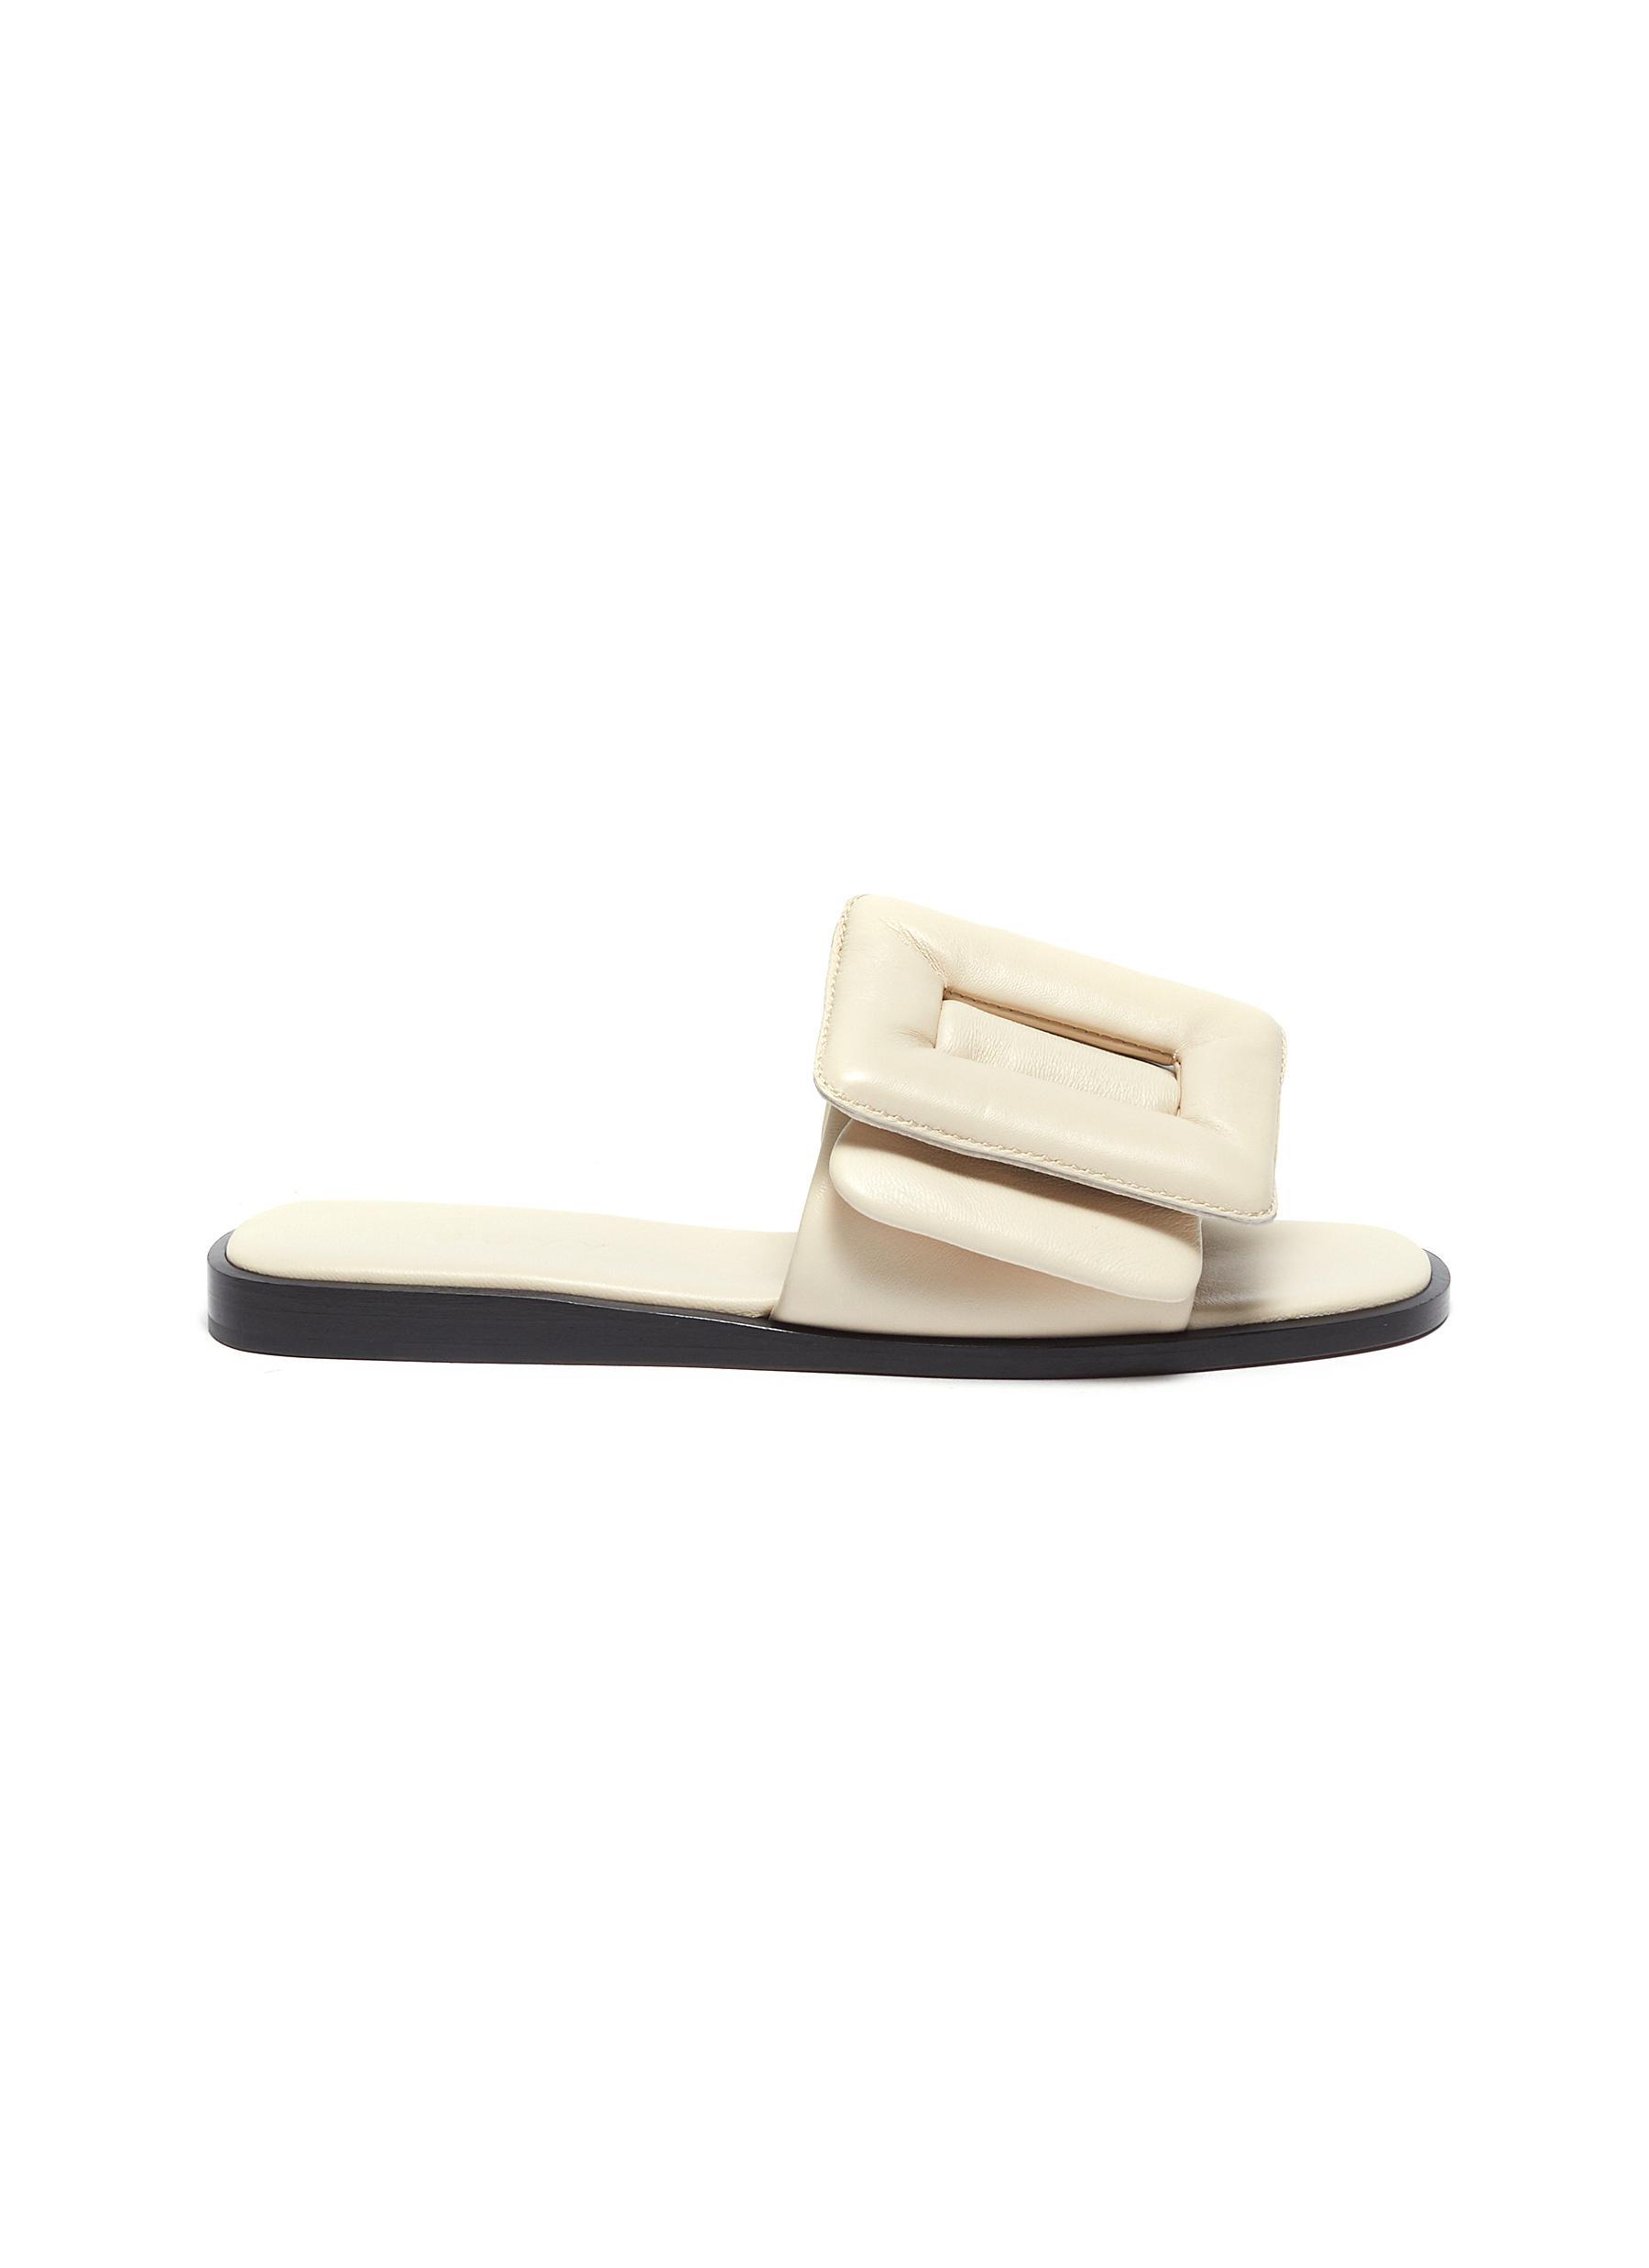 Boyy Flats Puffy single band buckle leather sandal